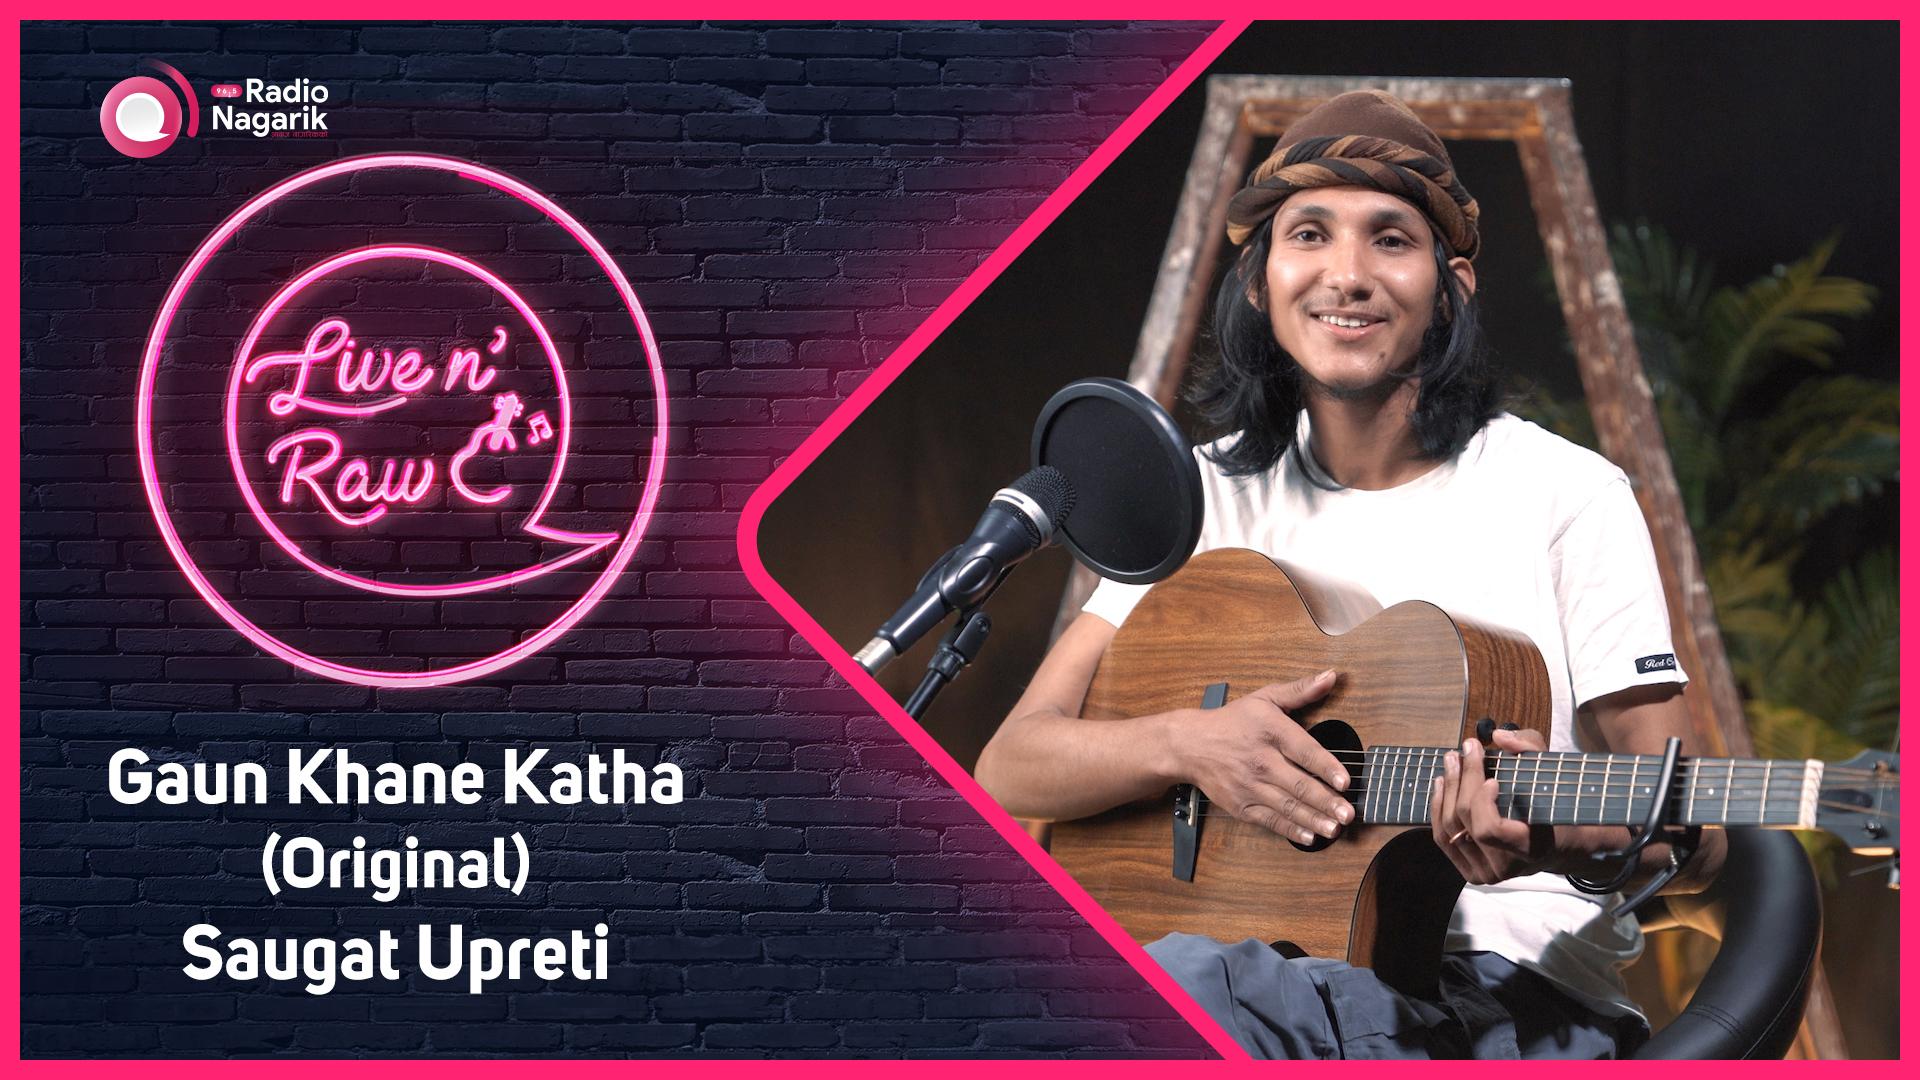 KAALA (Saugat Upreti) - Gaun khane katha  (Original) / Live N' Raw